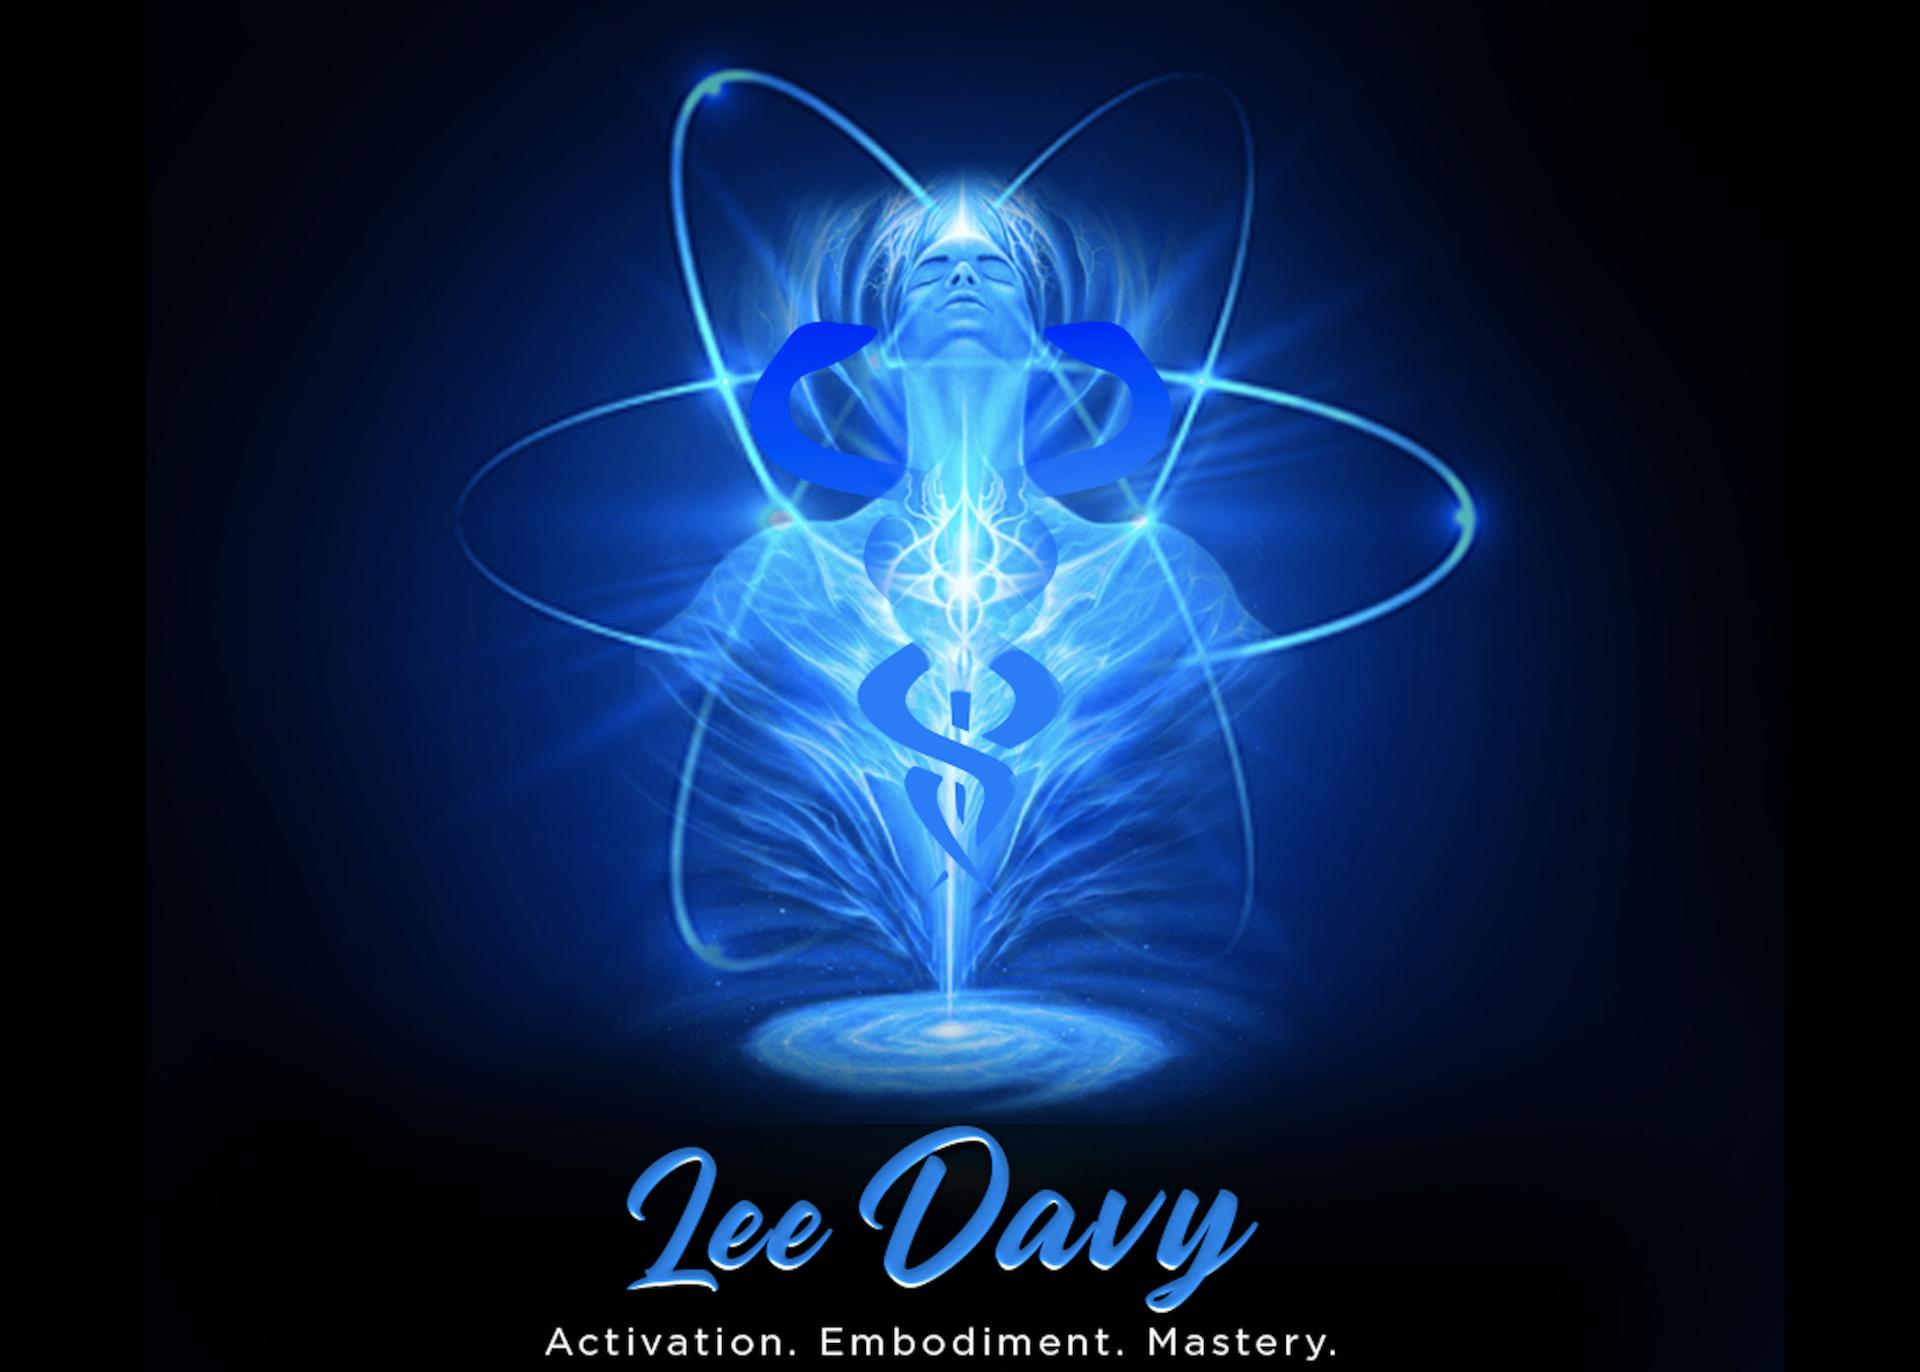 Lee Davy Logo